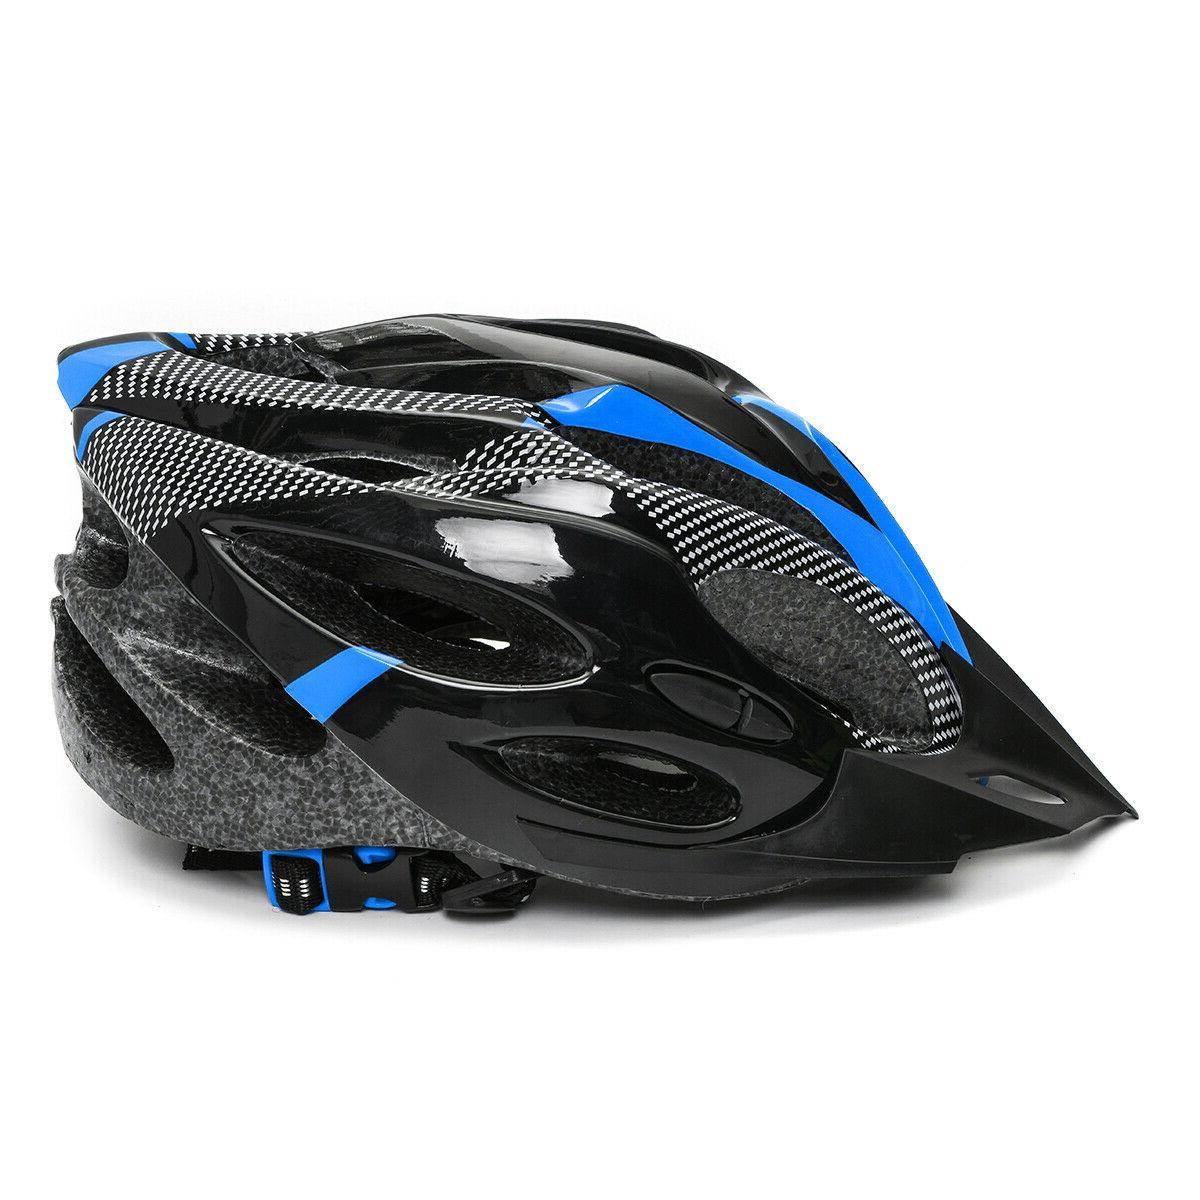 Bike Helmet Red Color With Visor USA